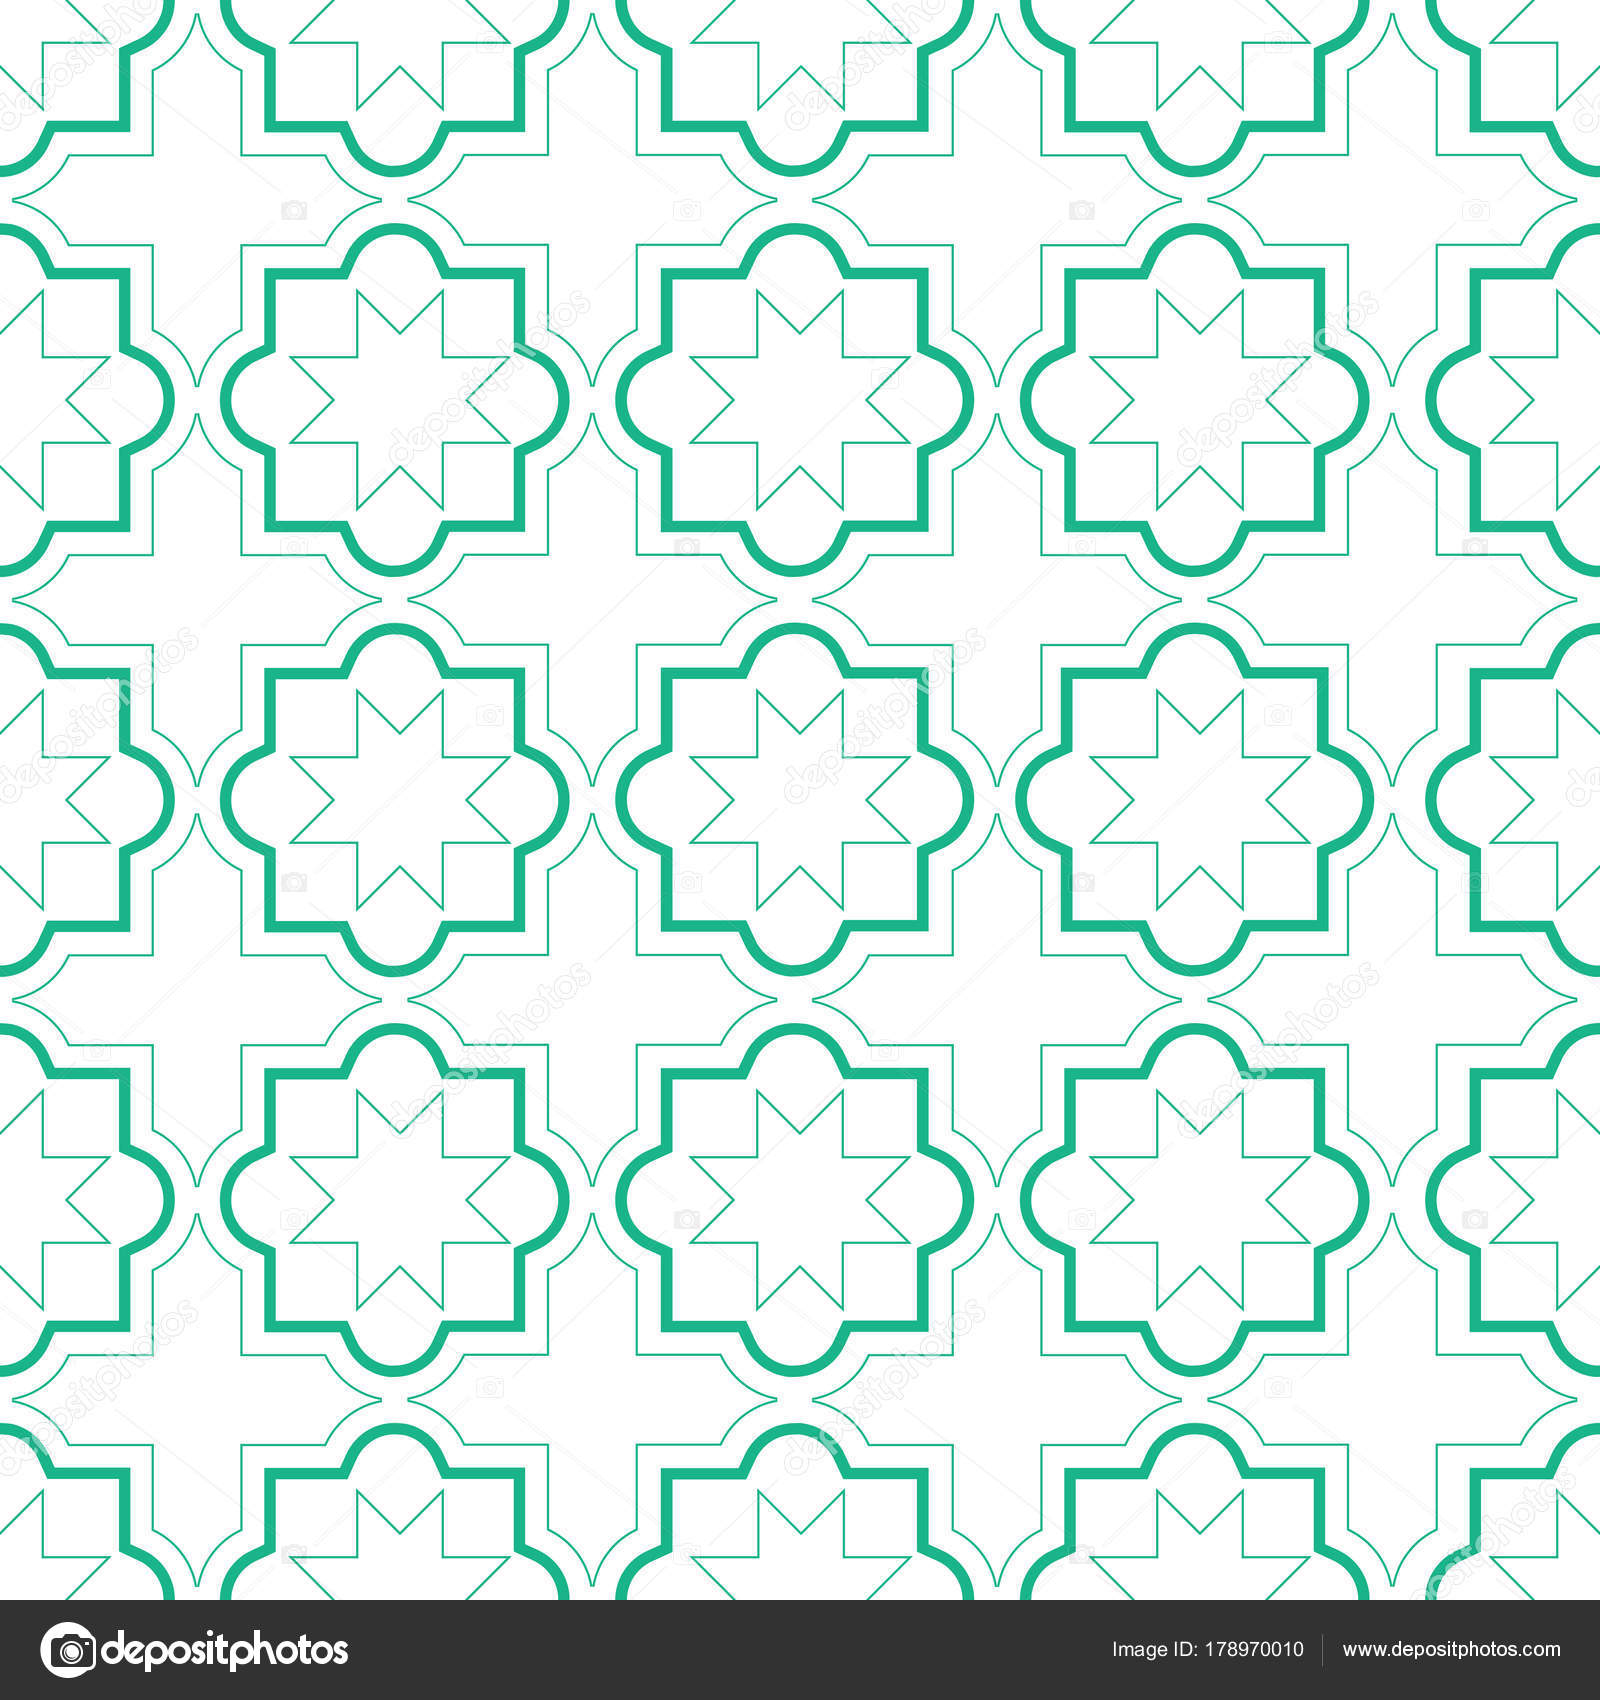 Marokkanische Fliesen Geometrischen Musterdesign Vektor Fliesen ...